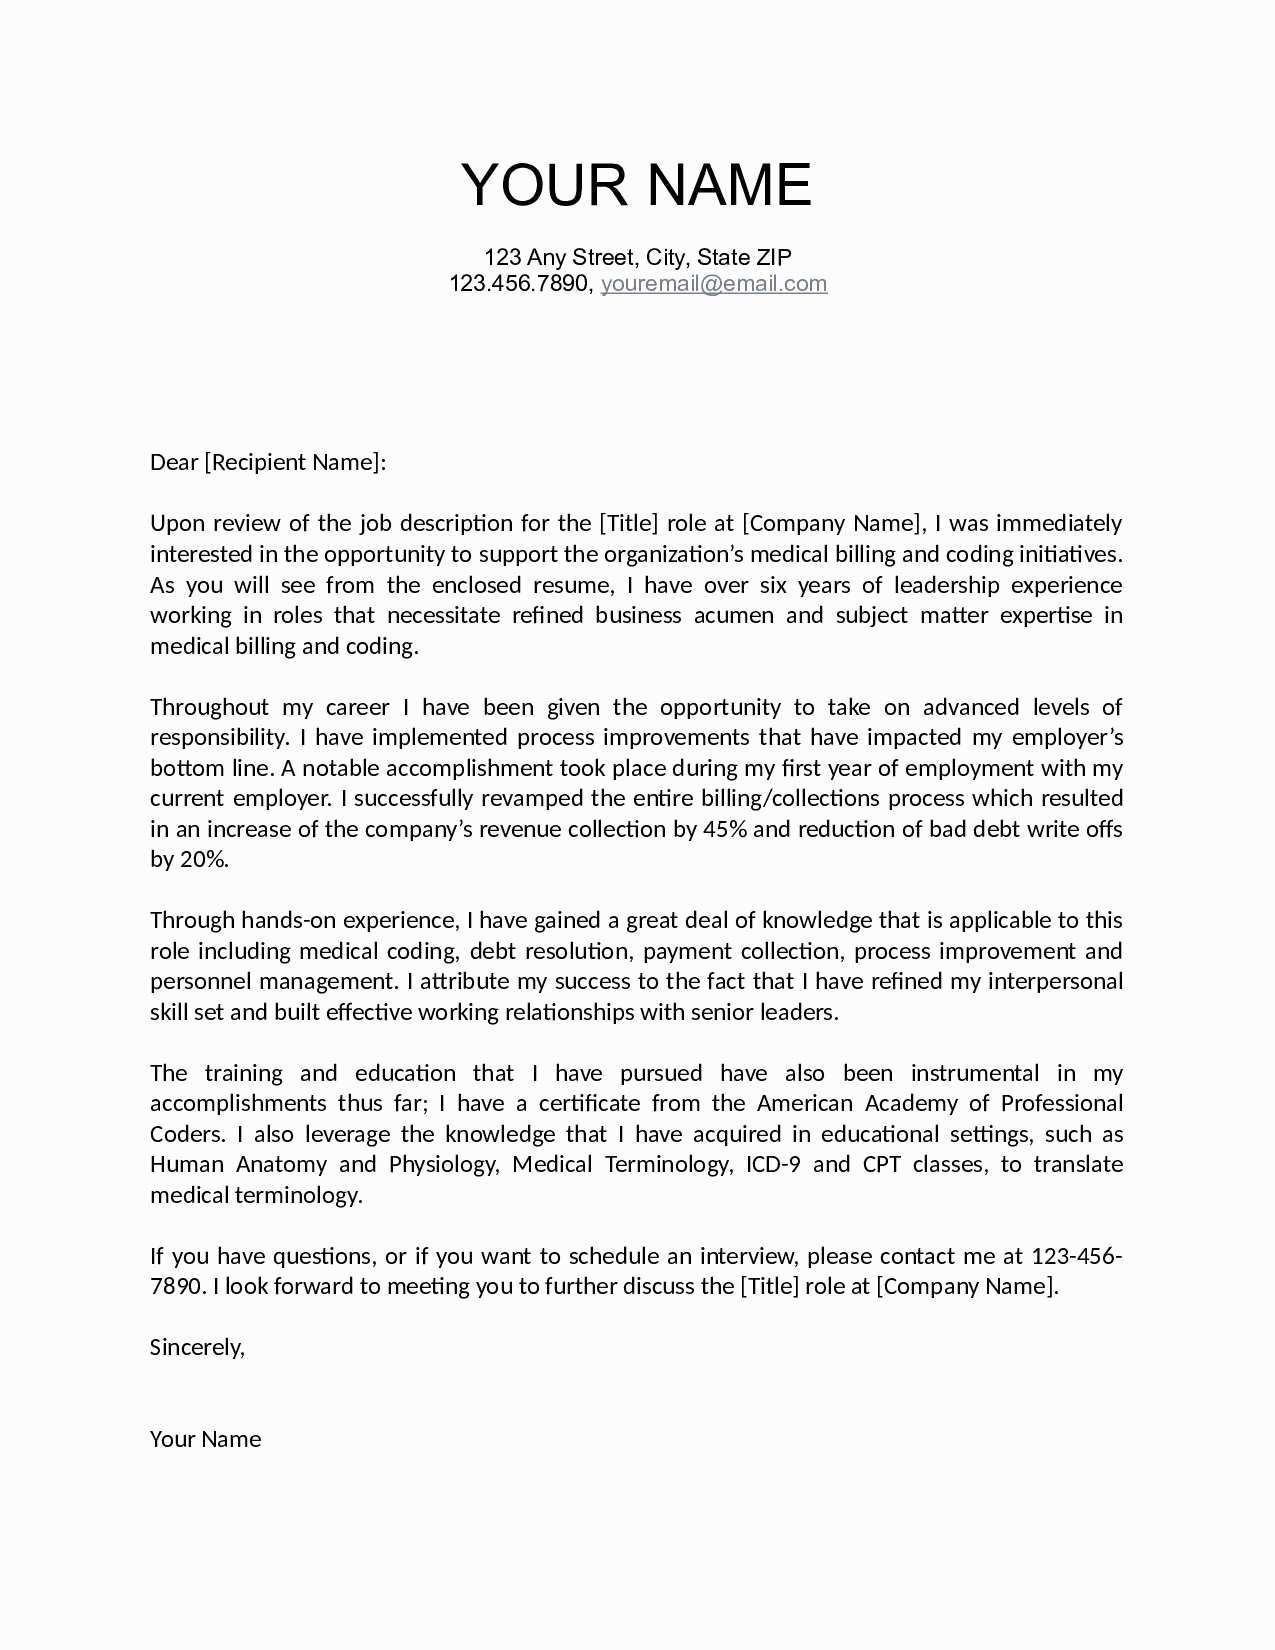 Sample Cover Letter Template Word - Covering Letter for Work Experience Best Job Fer Letter Template